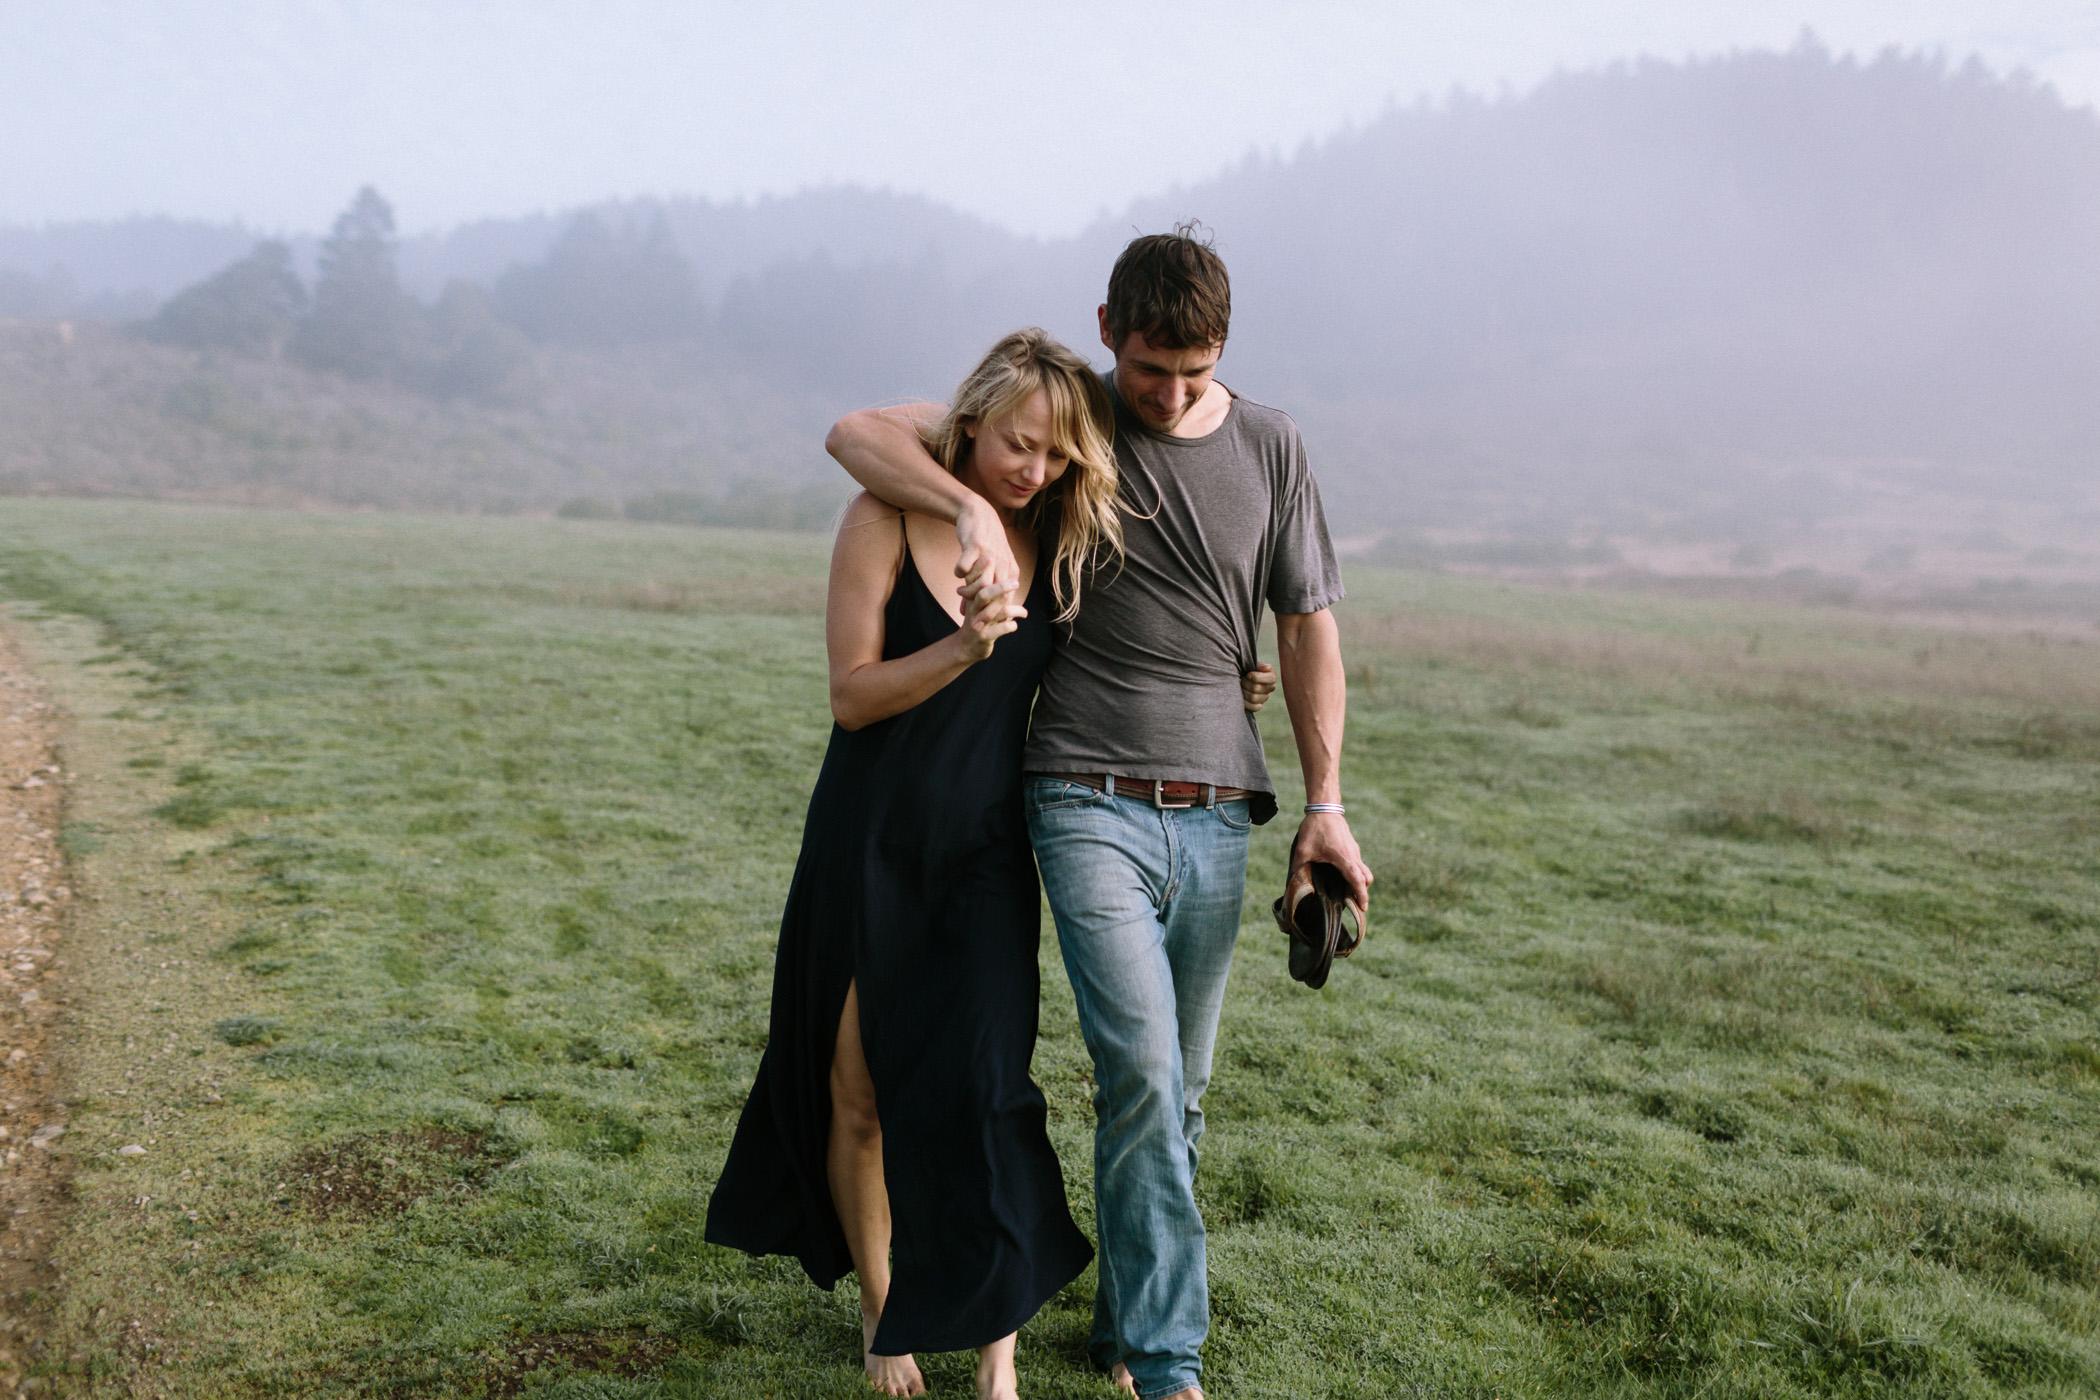 Elk-California-Couple-Walking-2.jpg